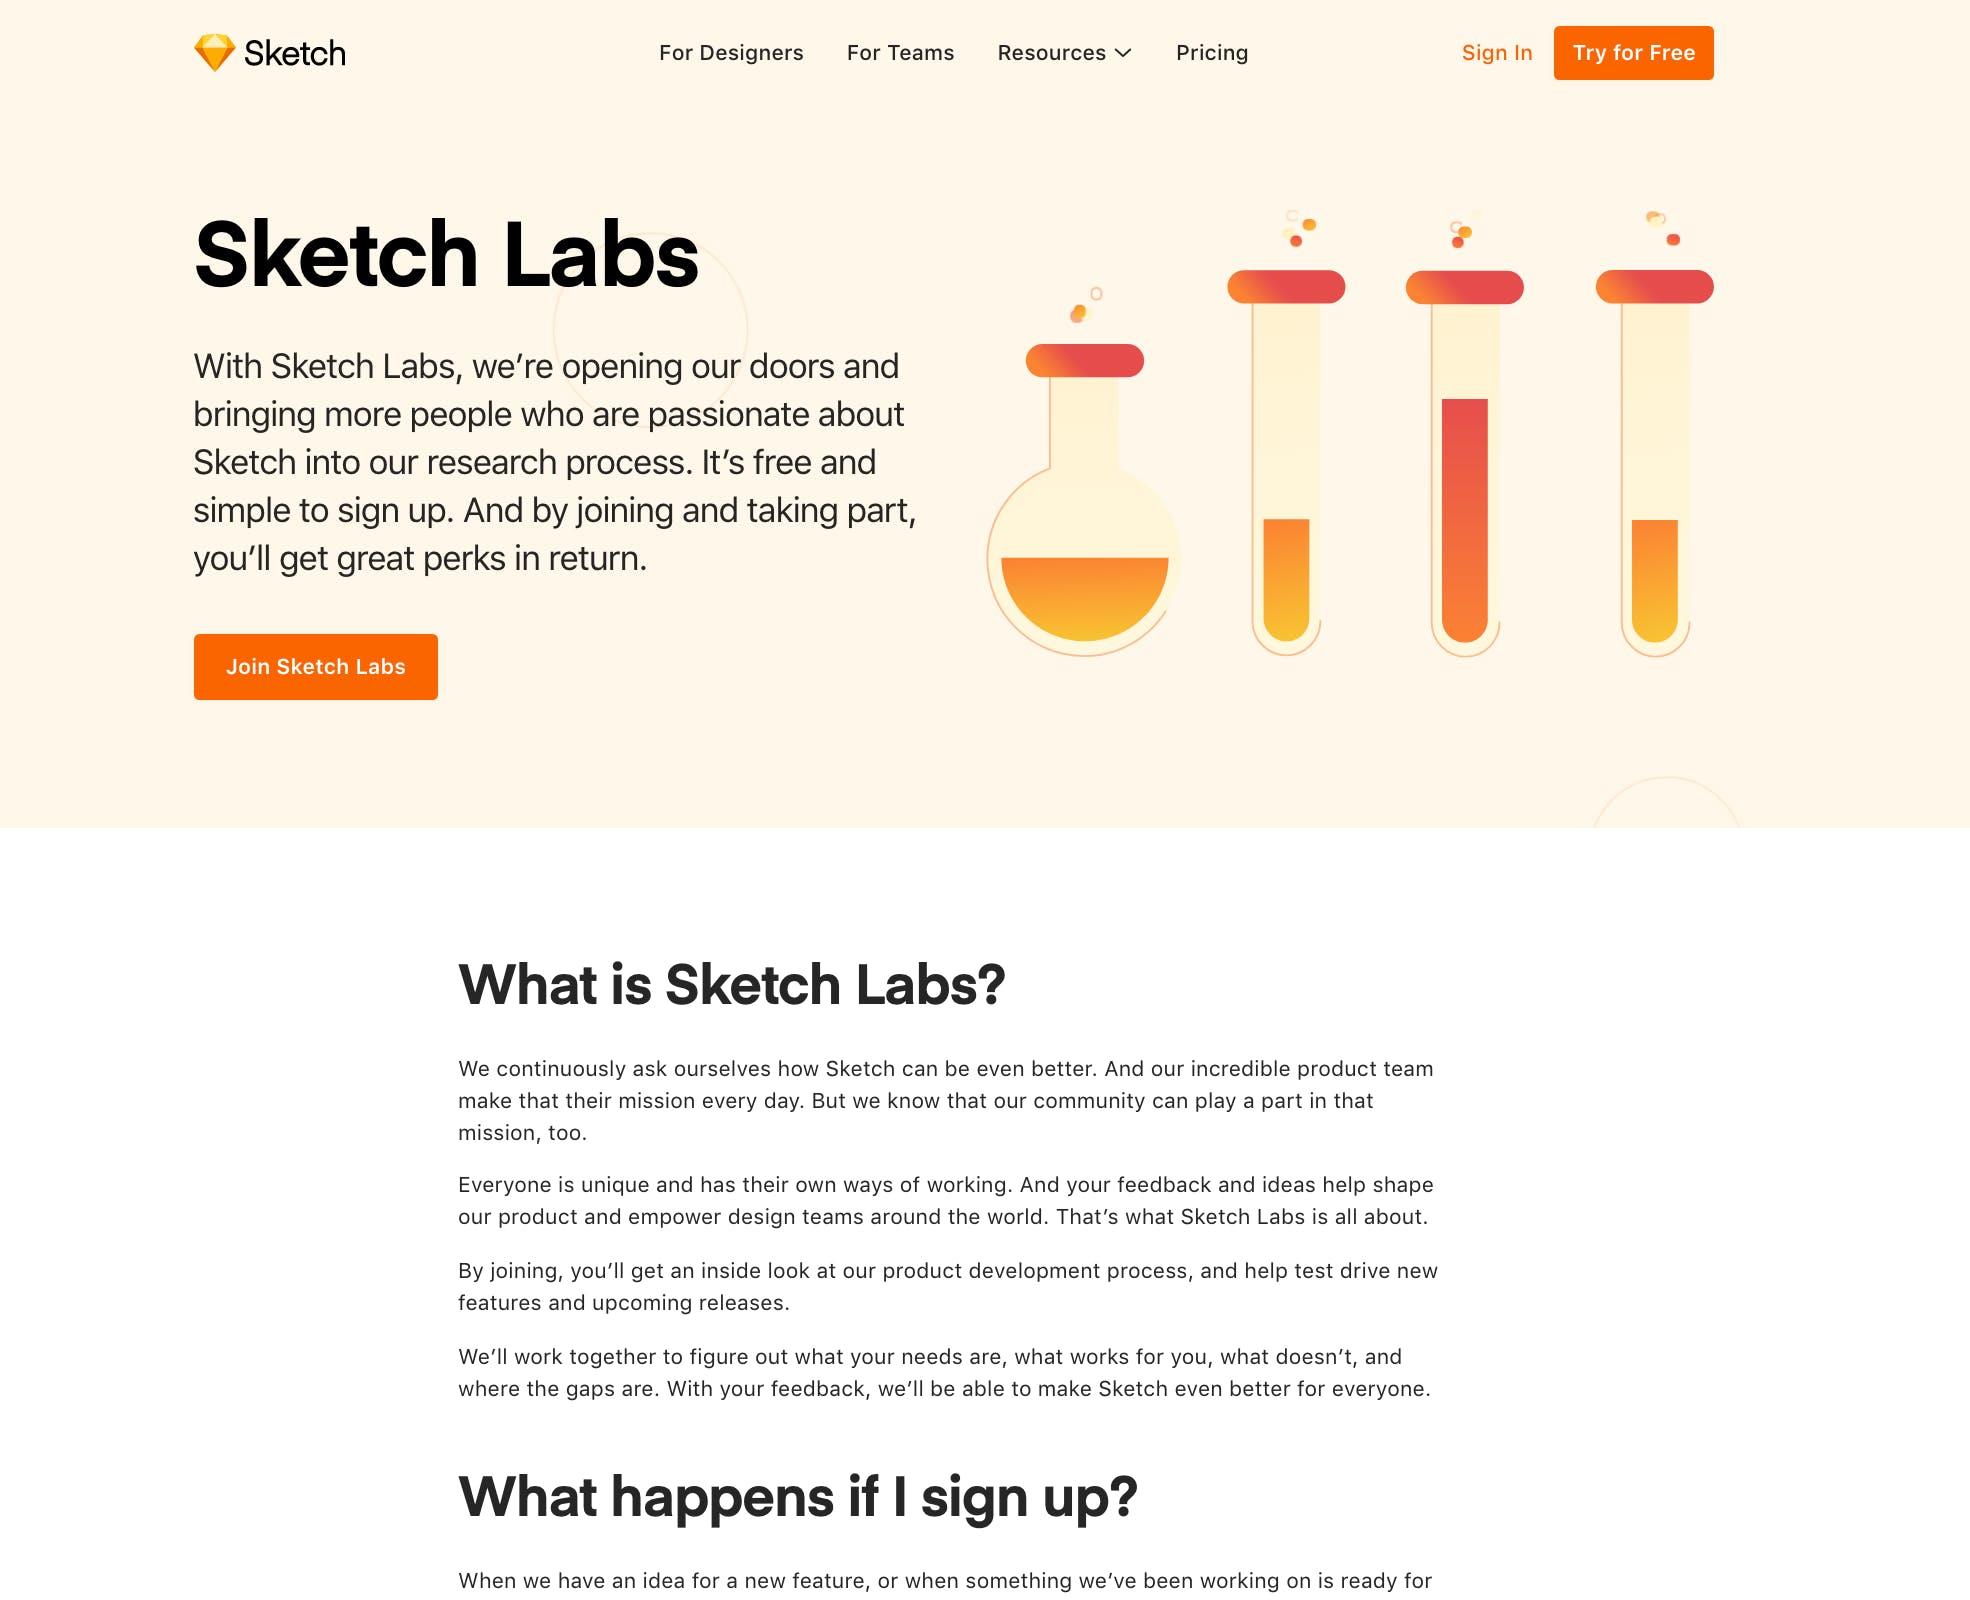 sketch labs recruit research participants